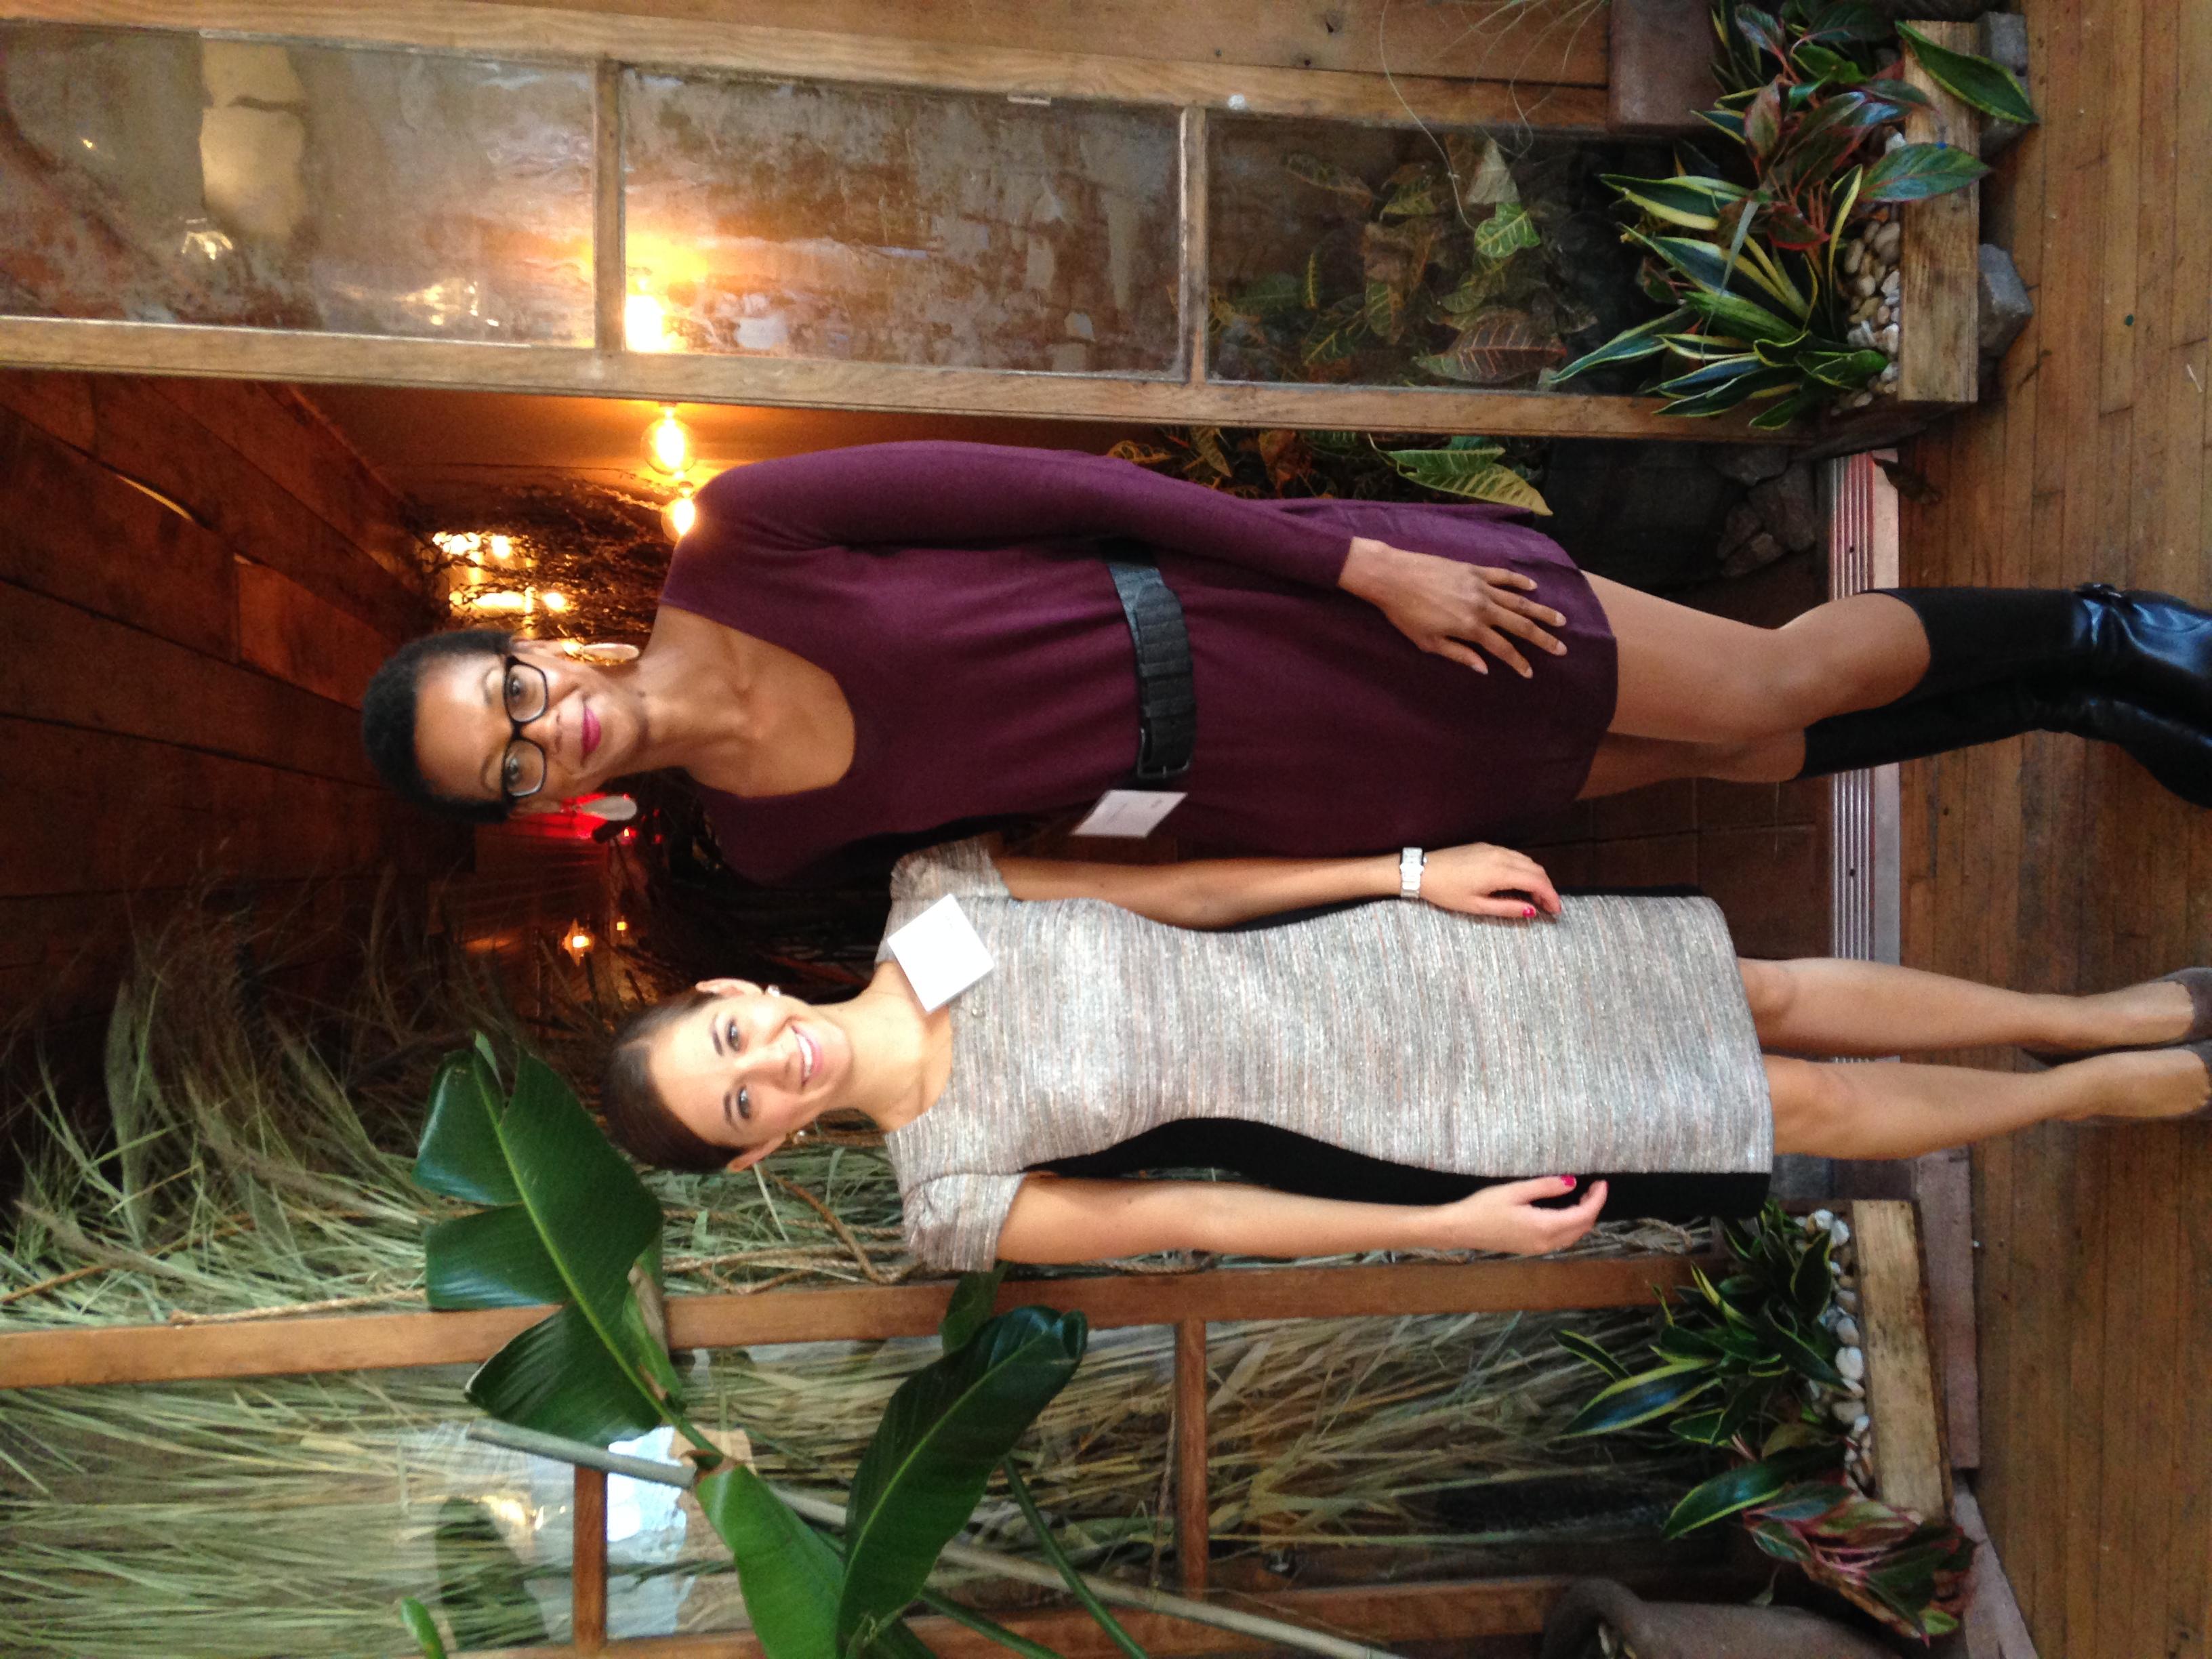 With Jessica Beckhart of Avon.